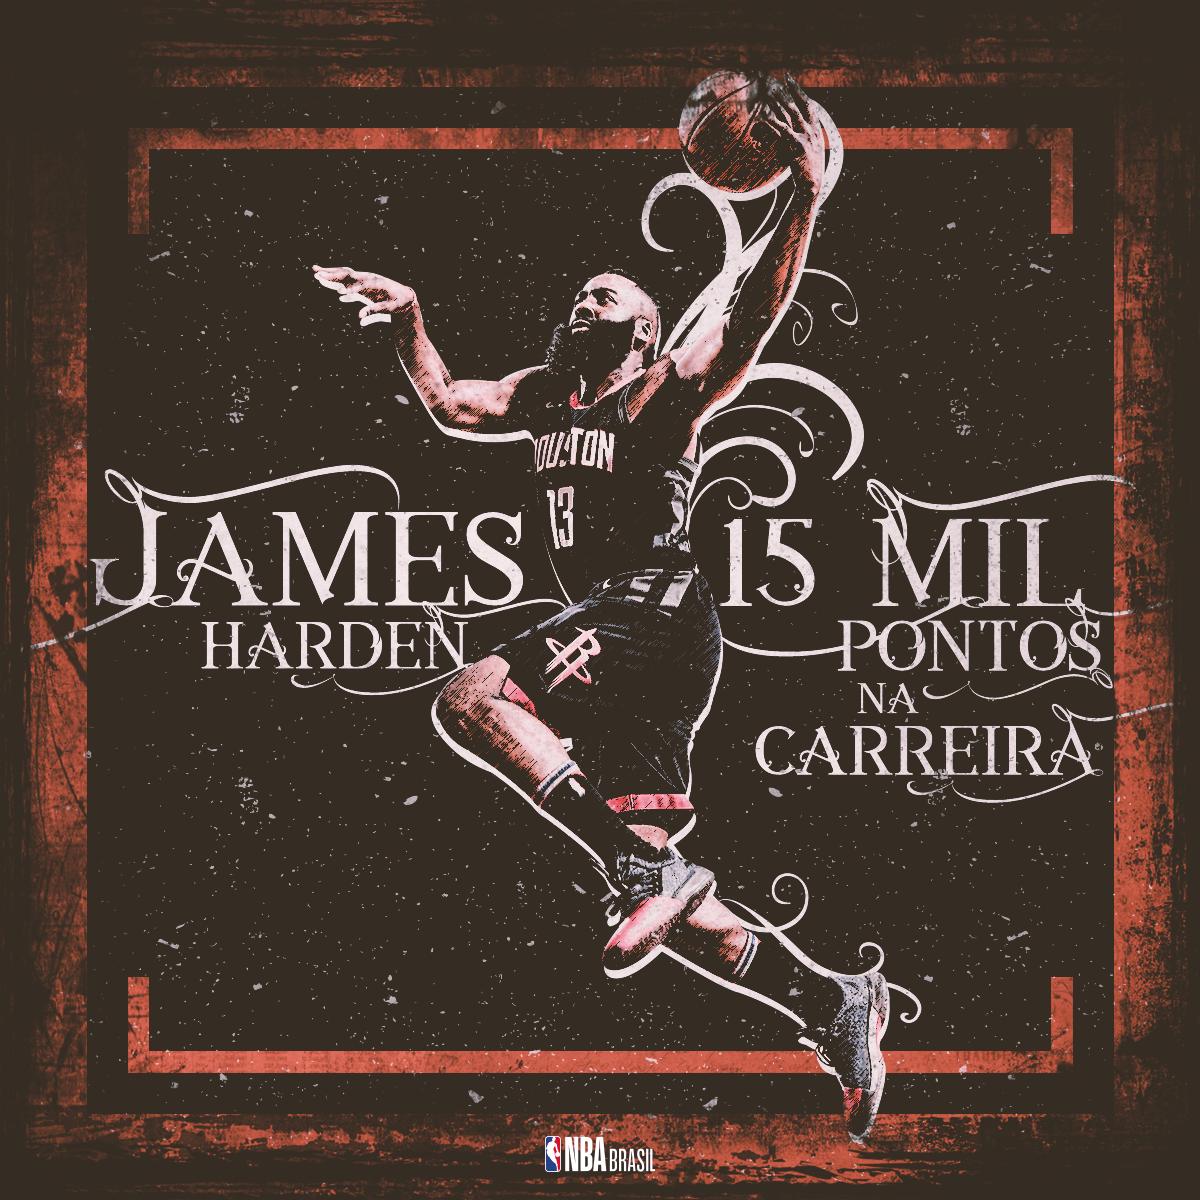 NBA-especiais-James-Harden-15mil-pontos